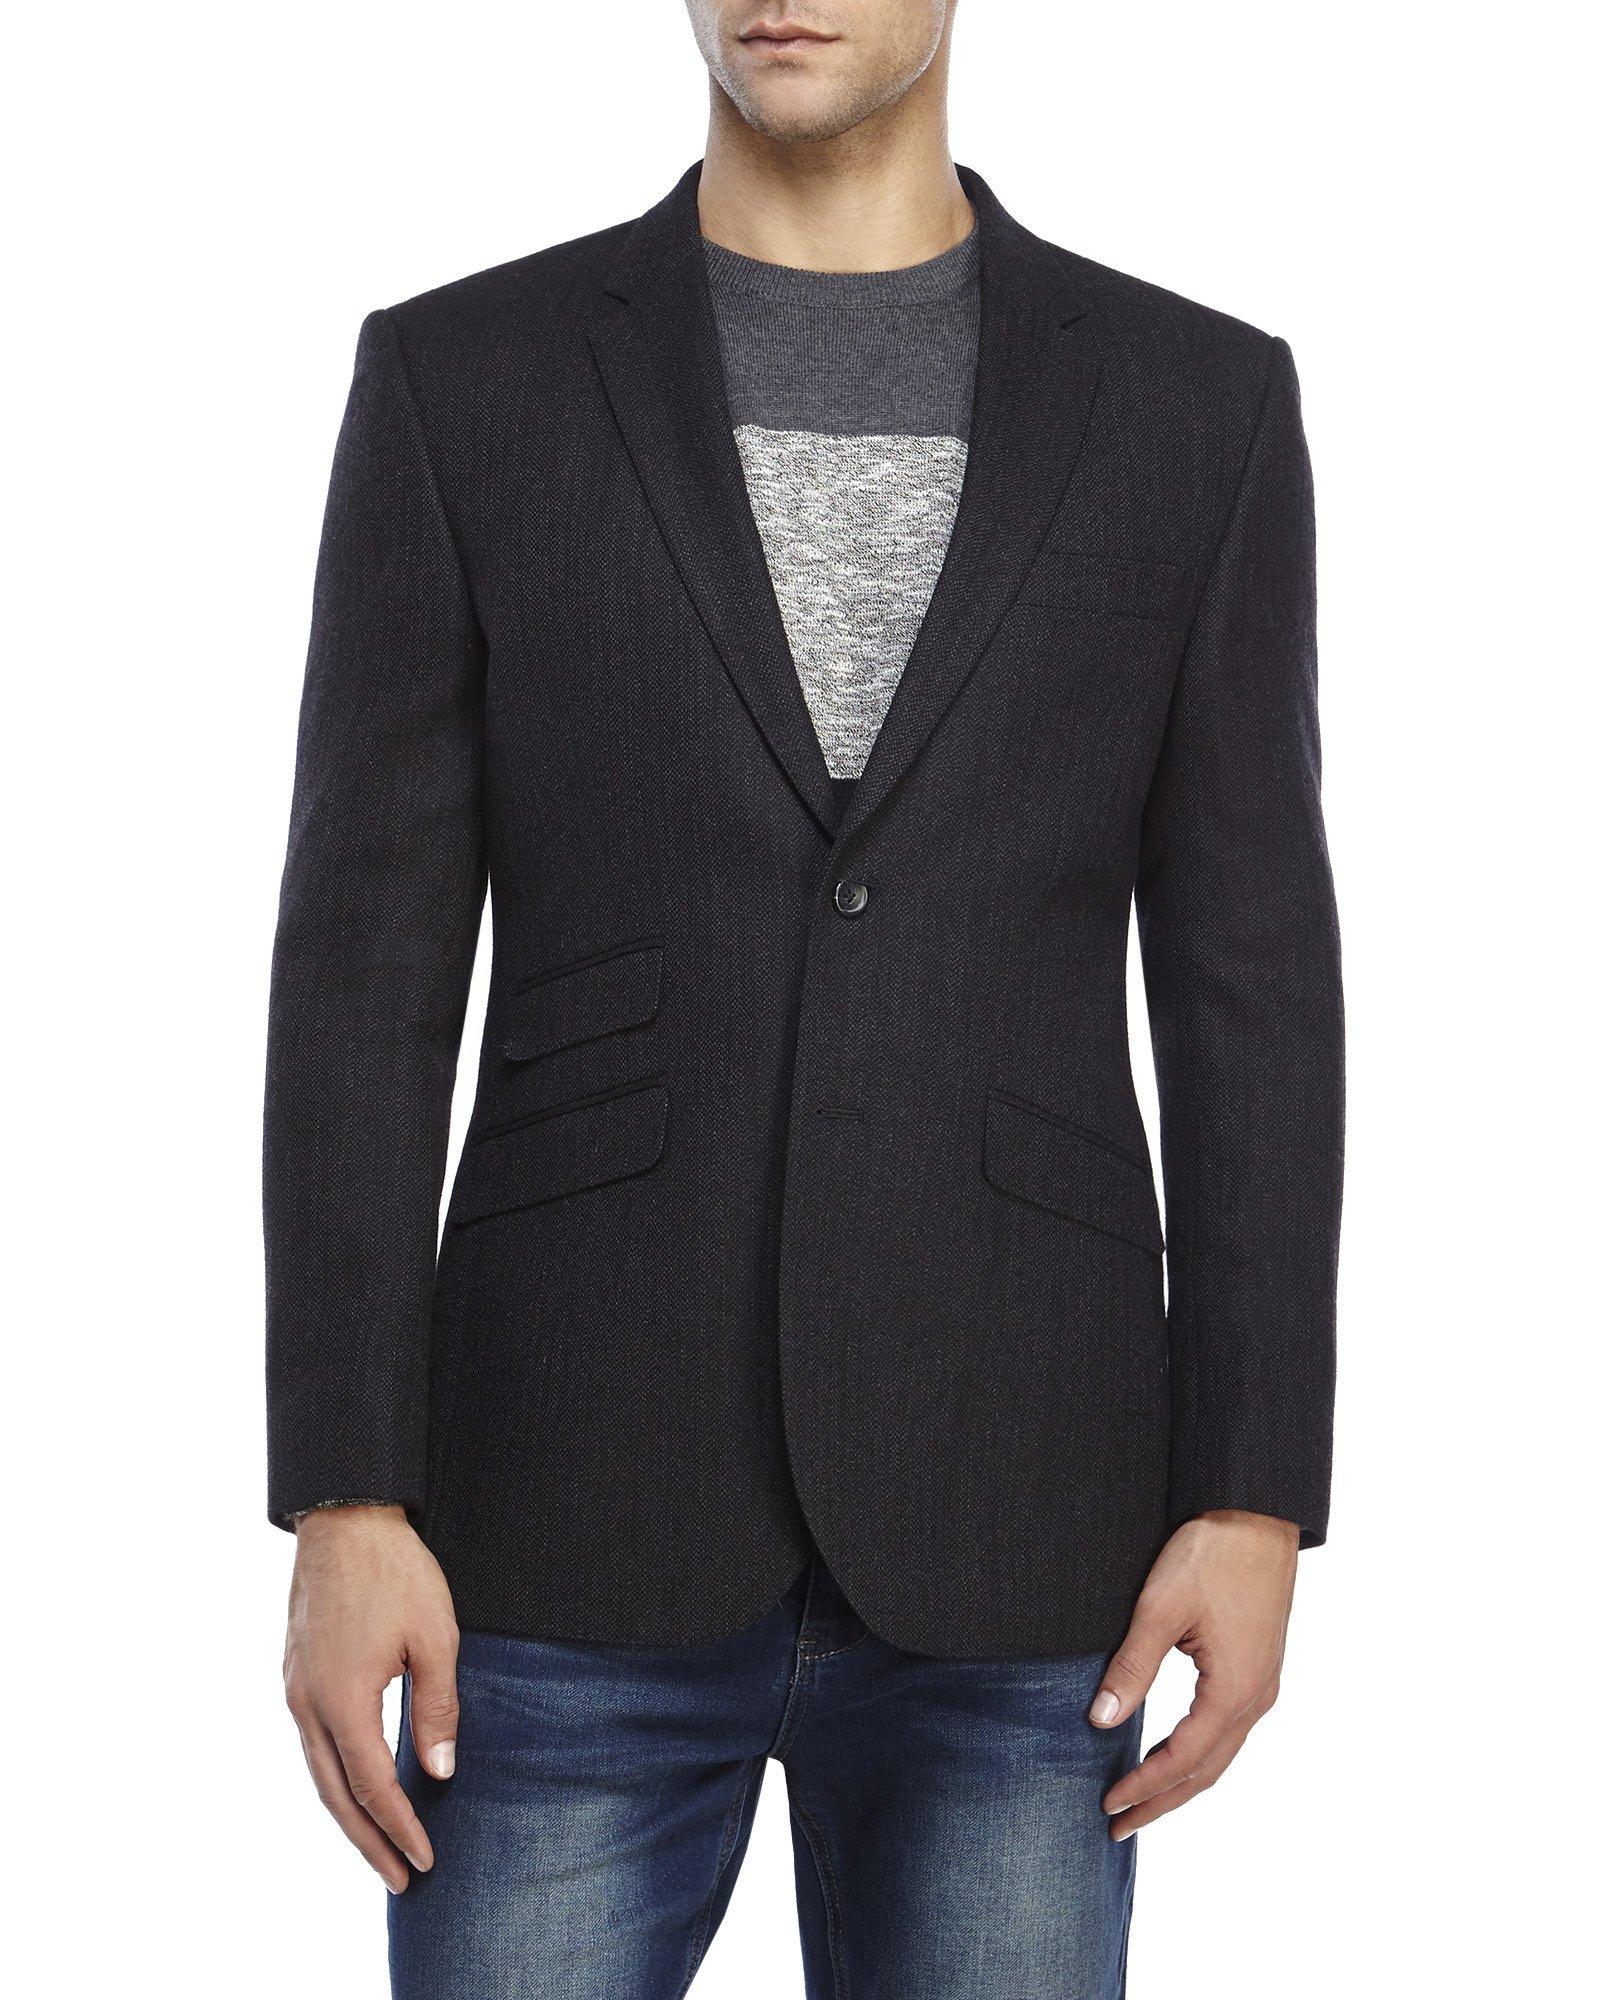 Lyst English Laundry Tweed Sport Coat In Black For Men